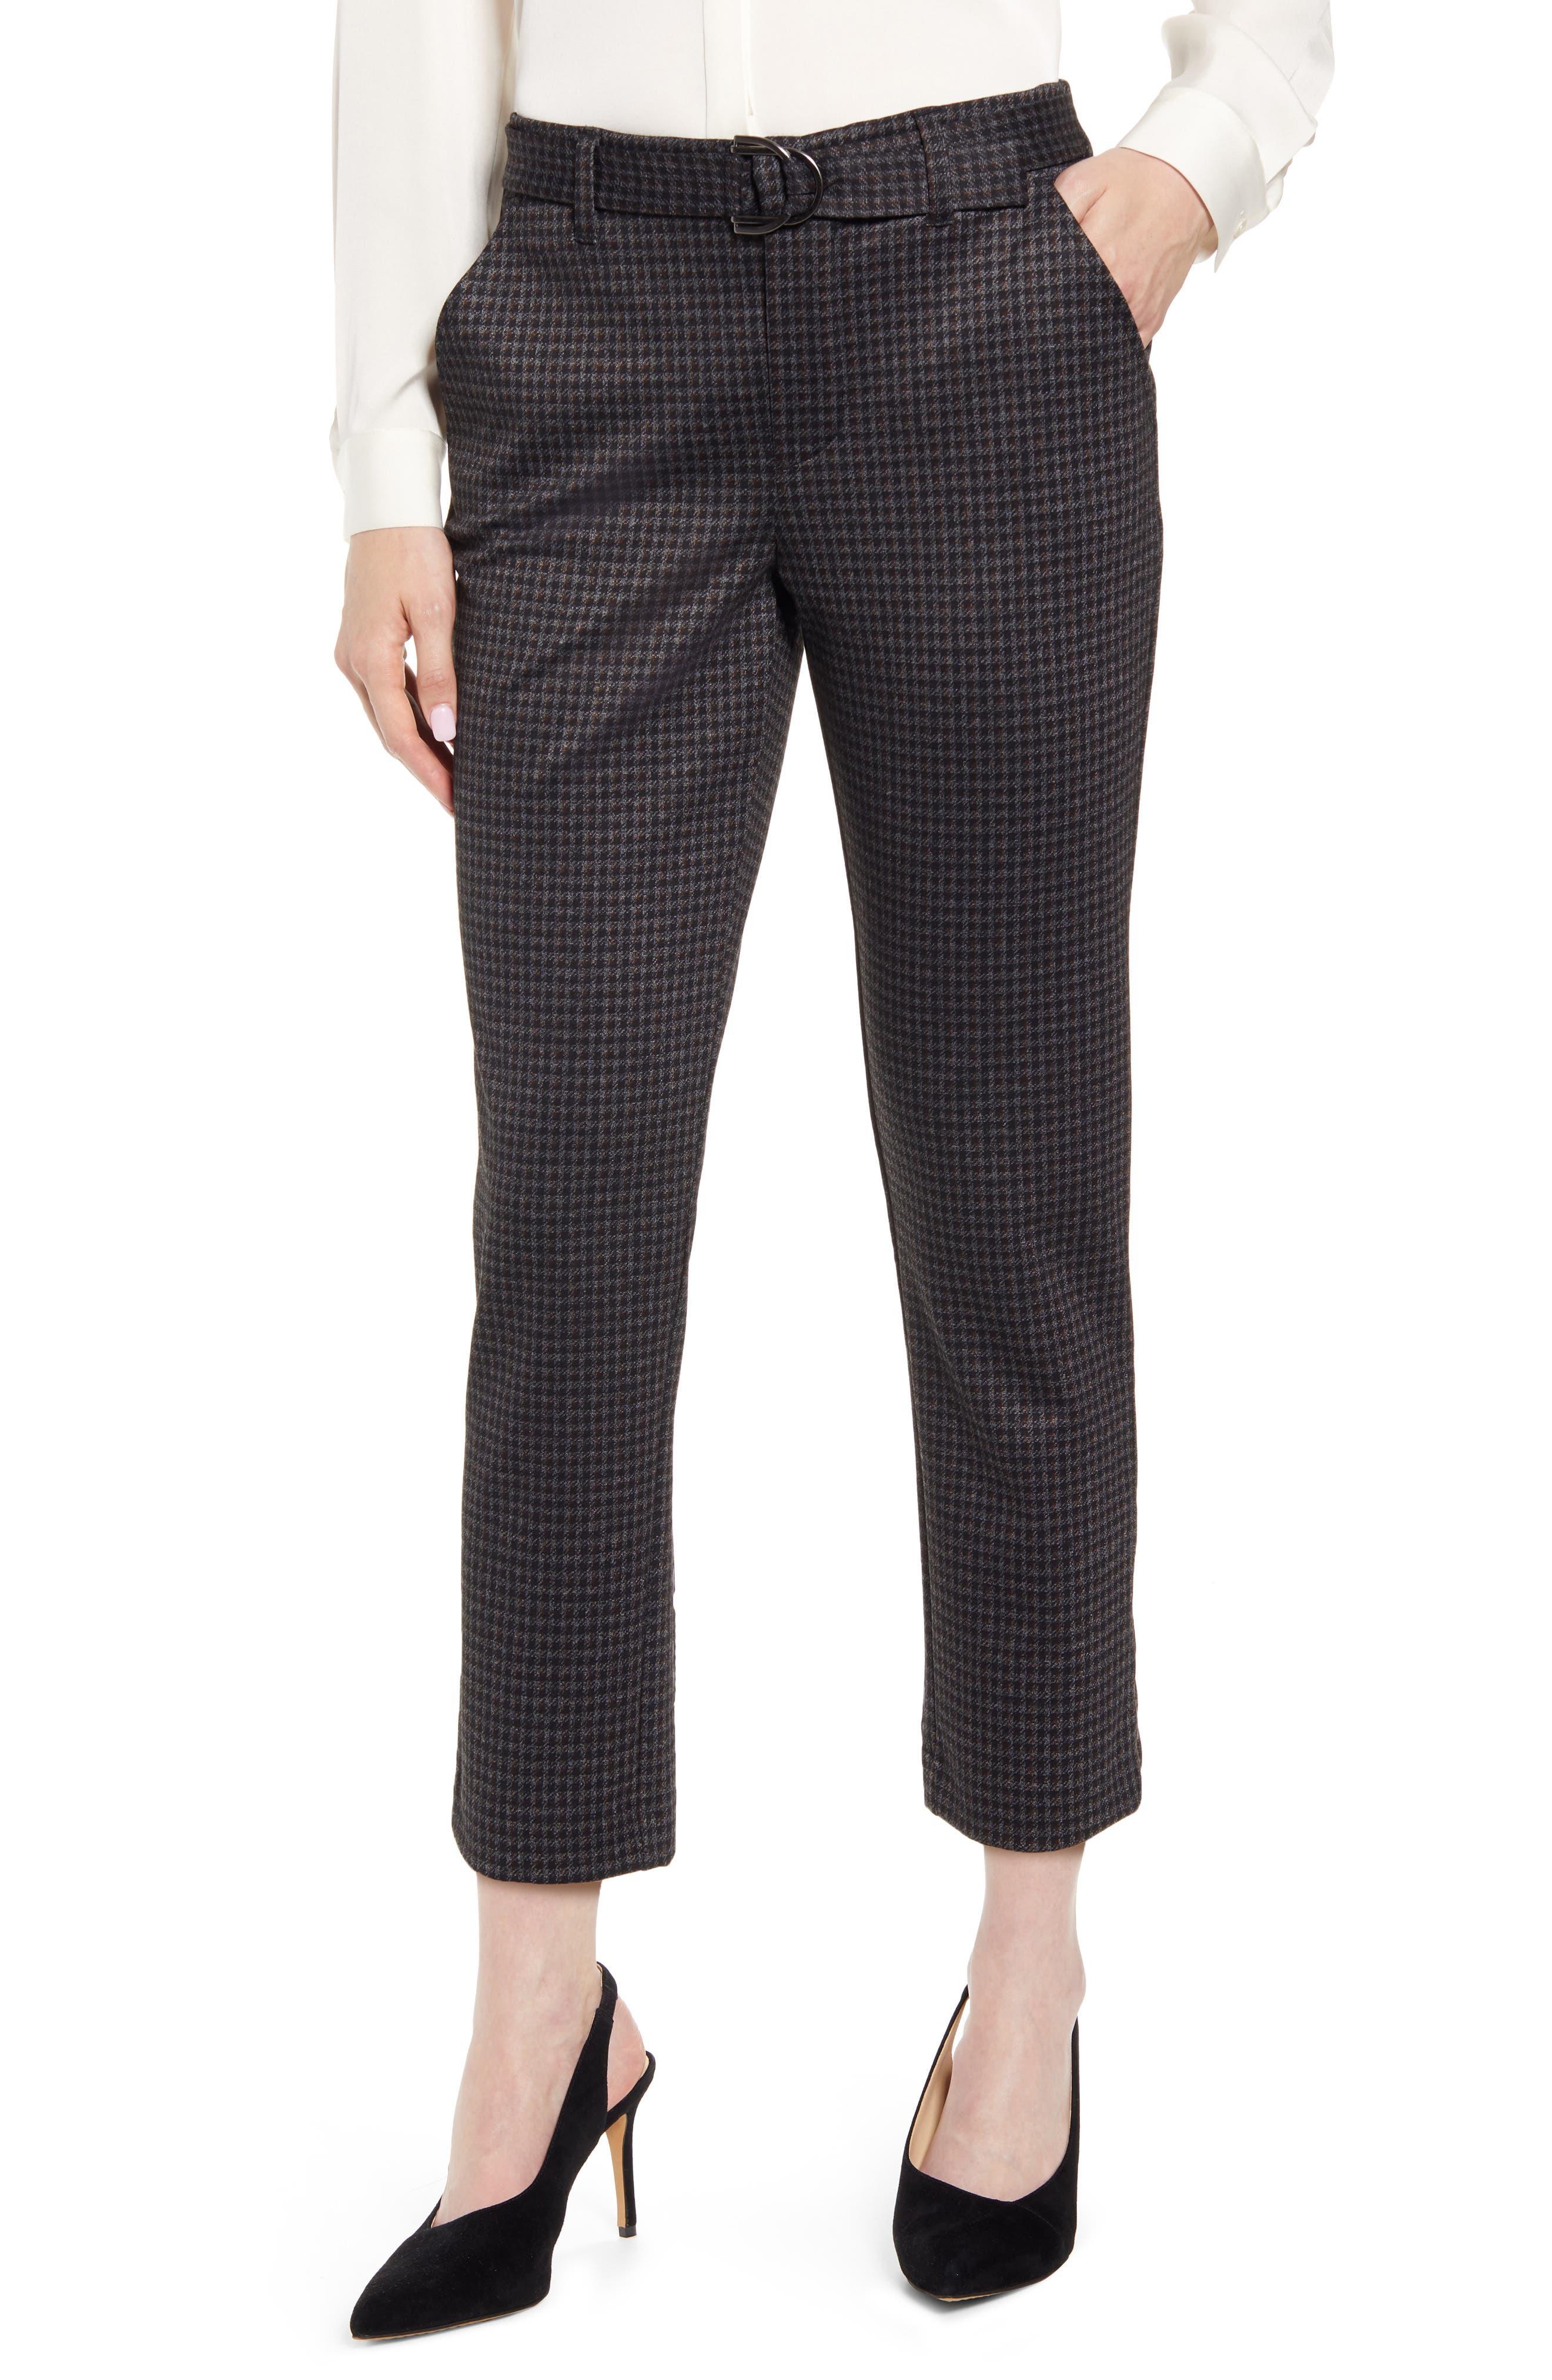 Wit & Wisdom Ab-solution High Waist Straight Leg Crop Pants (Regular & Petite) (Nordstrom Exclusive)